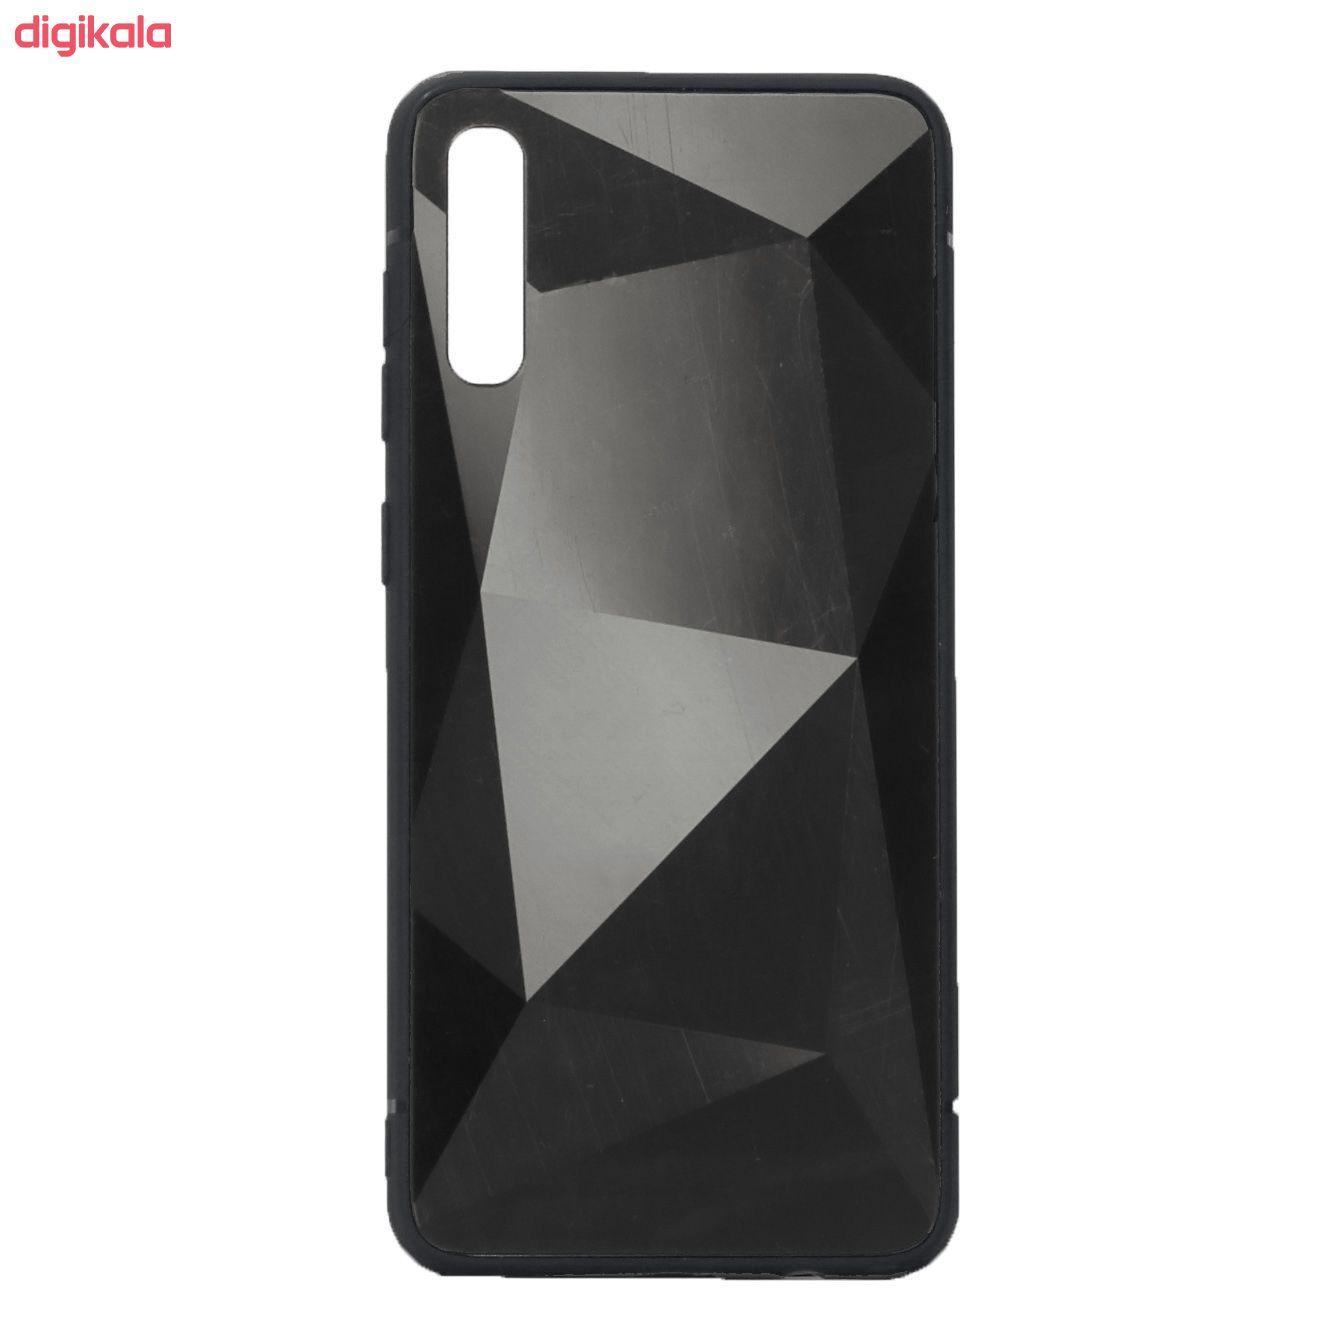 کاور طرح الماس مدل mr-506 مناسب برای گوشی موبایل سامسونگ Galaxy A50/A50s/a30s main 1 4